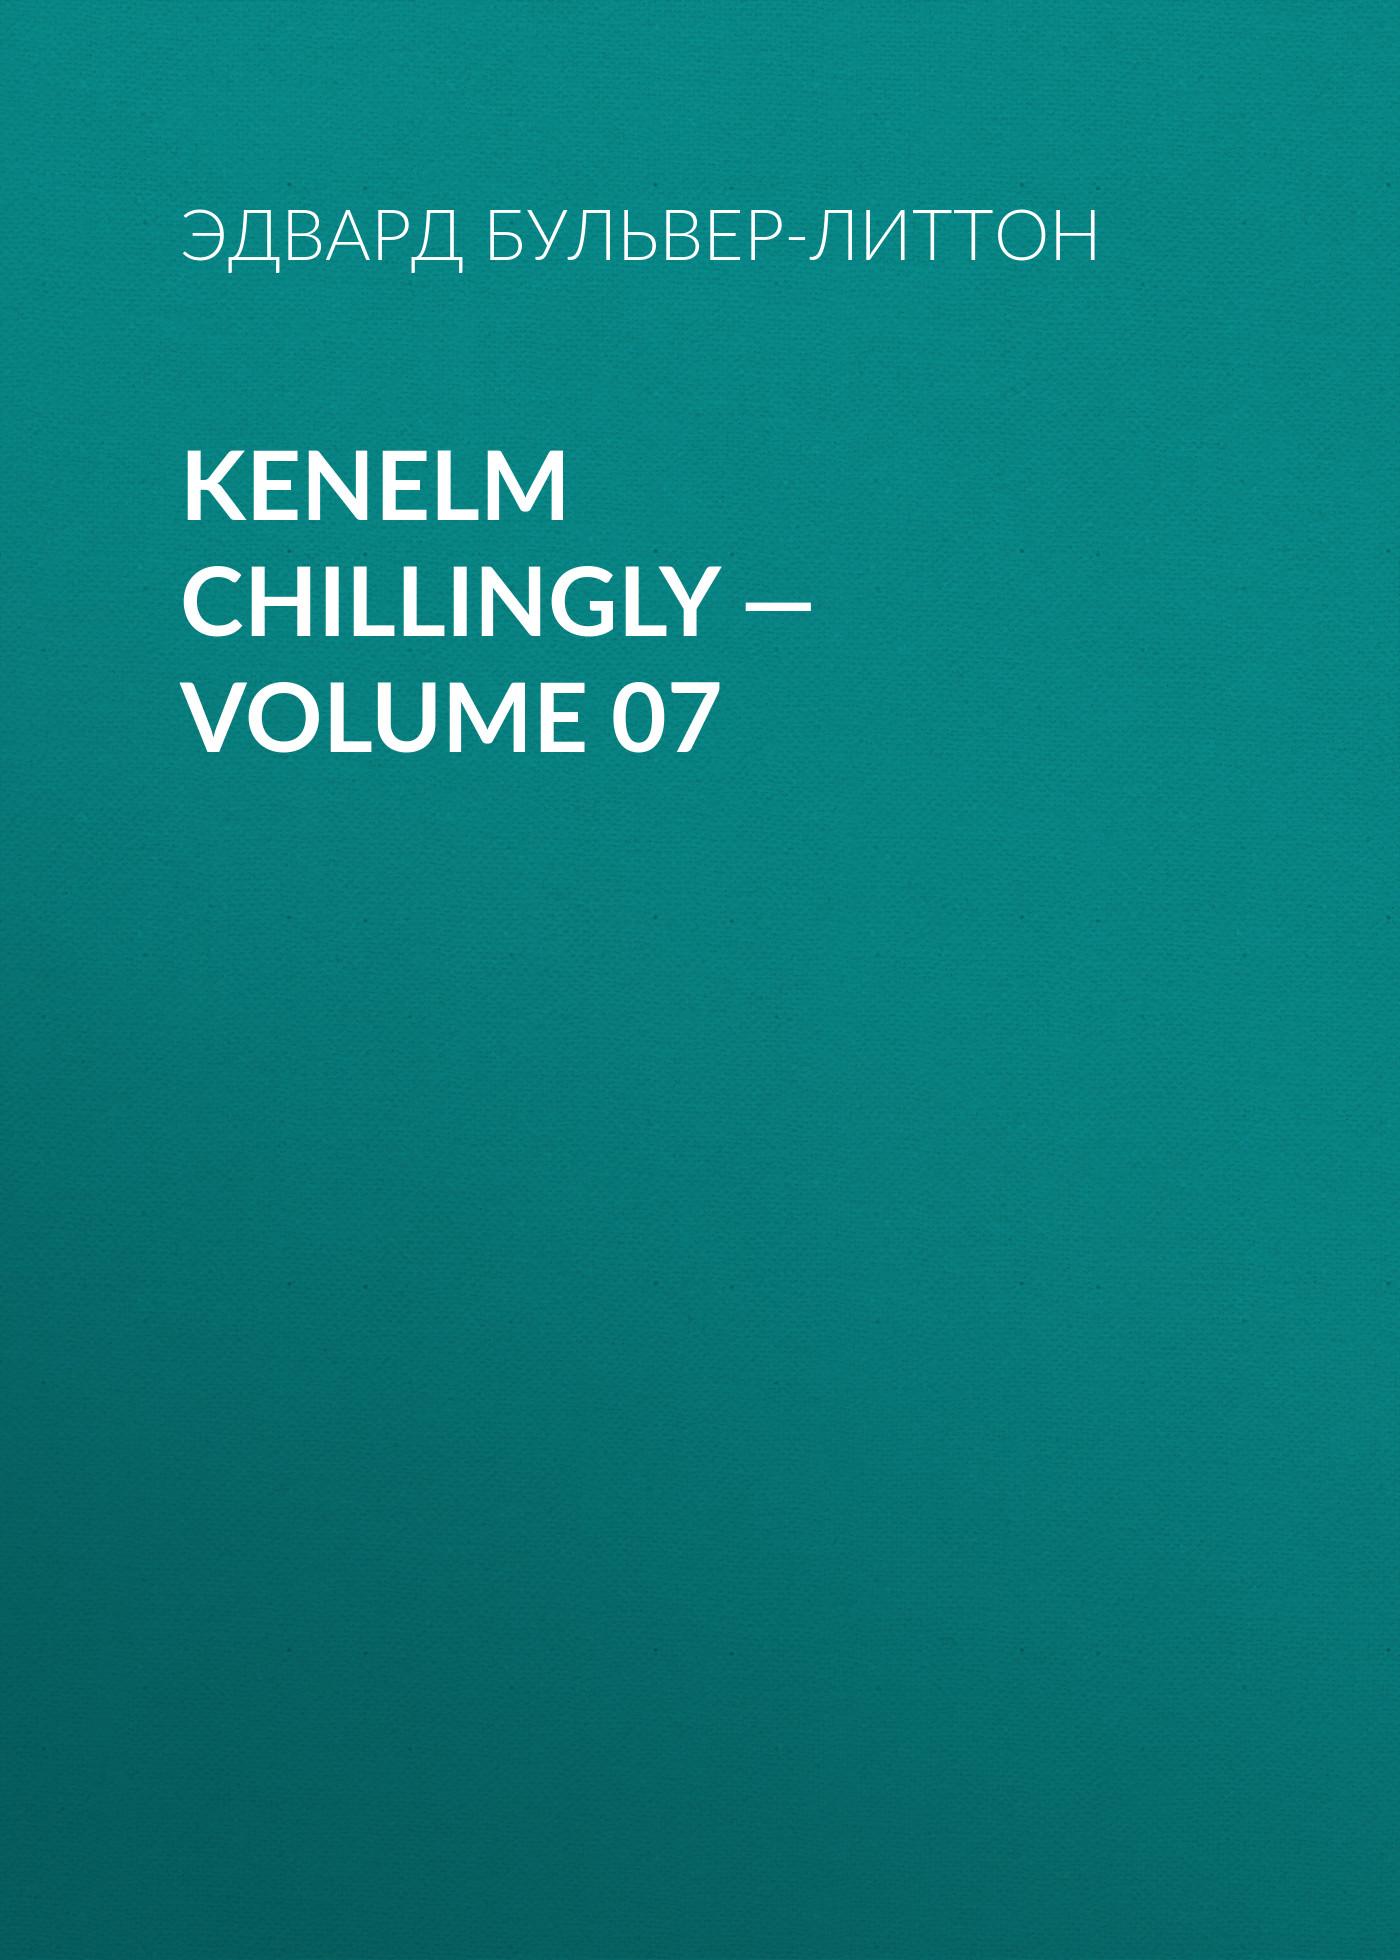 Kenelm Chillingly — Volume 07 ( Эдвард Бульвер-Литтон  )